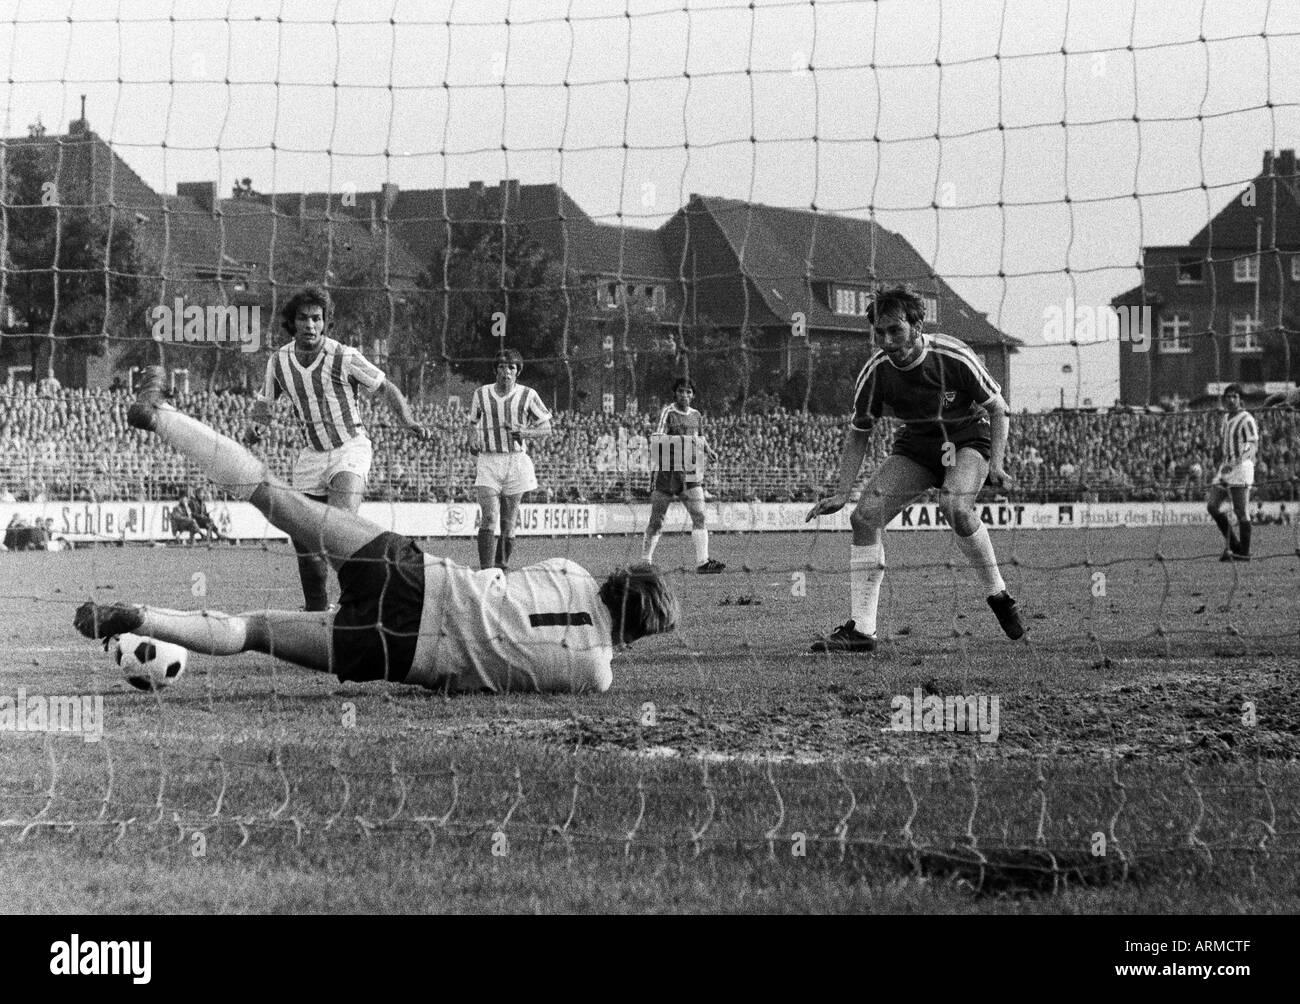 football, Regionalliga 1970/1971, promotion match to the Bundesliga 1971/1972, VfL Bochum versus VfL Osnabrueck 3:1, Stadium an der Castroper Strasse in Bochum, scene of the match, f.l.t.r. Erwin Braun (Osnabrueck), Klaus Baumanns (Osnabrueck), keeper And - Stock Image